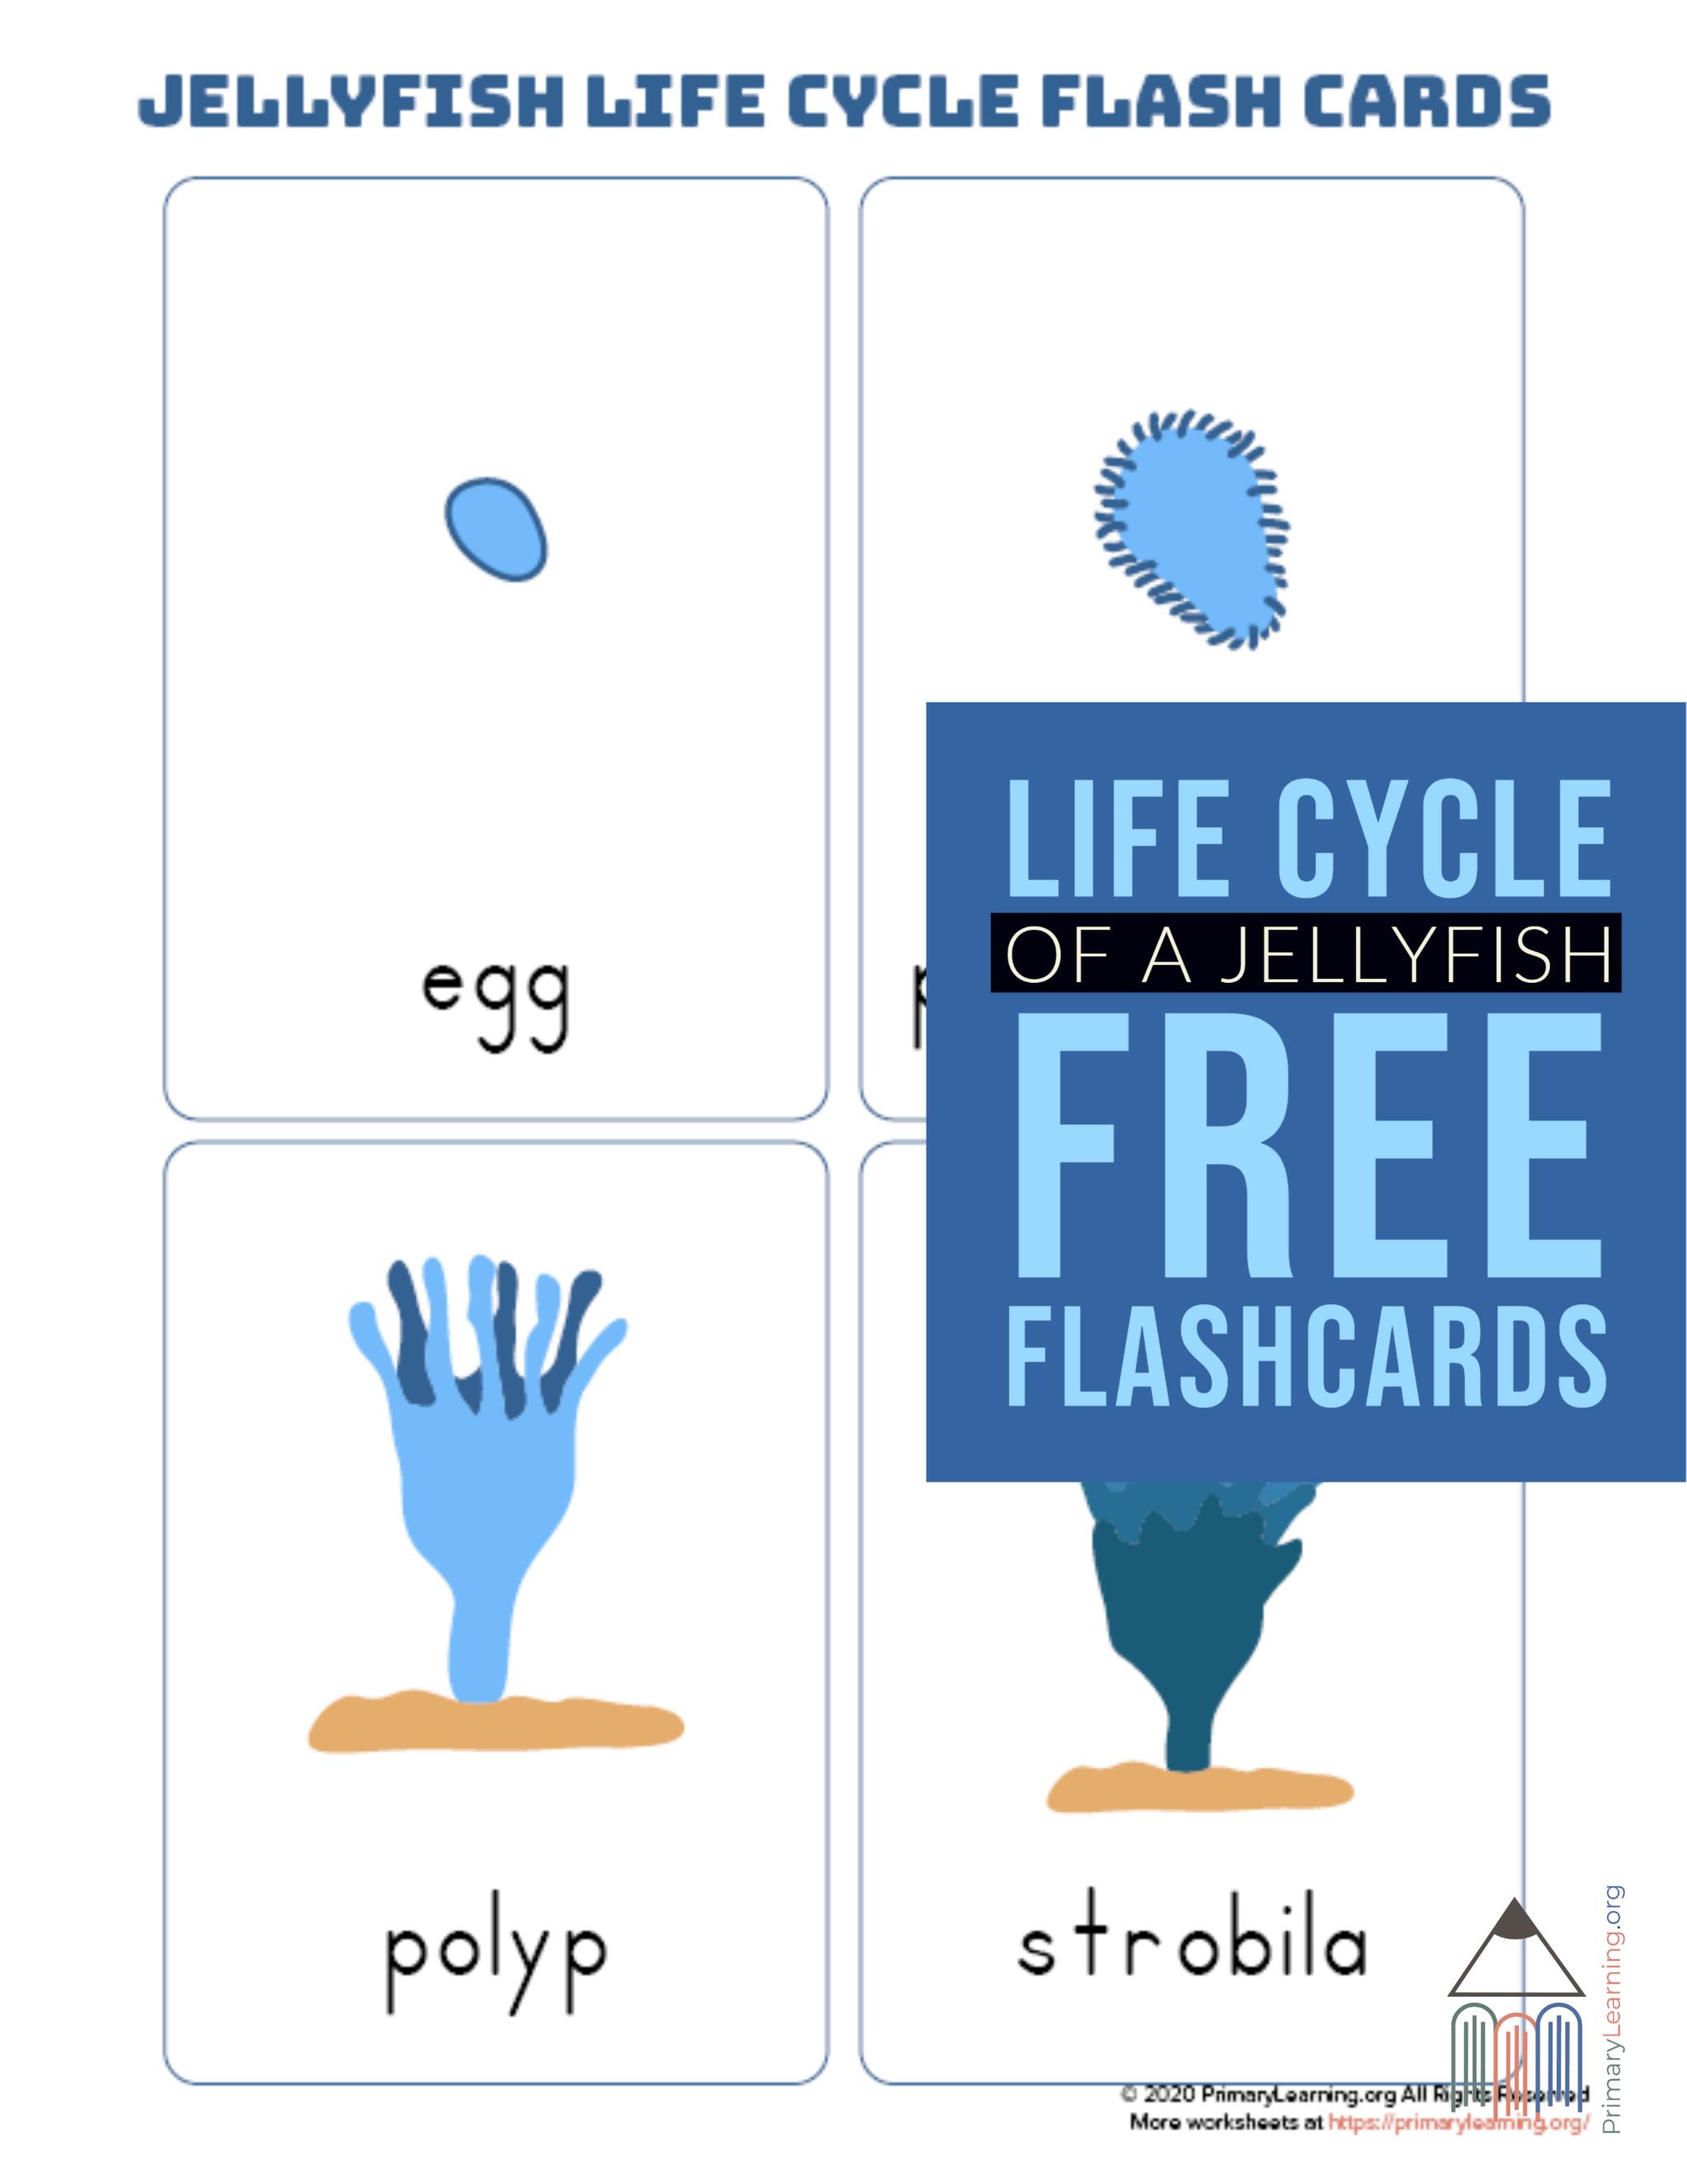 Jellyfish Life Cycle Flashcards